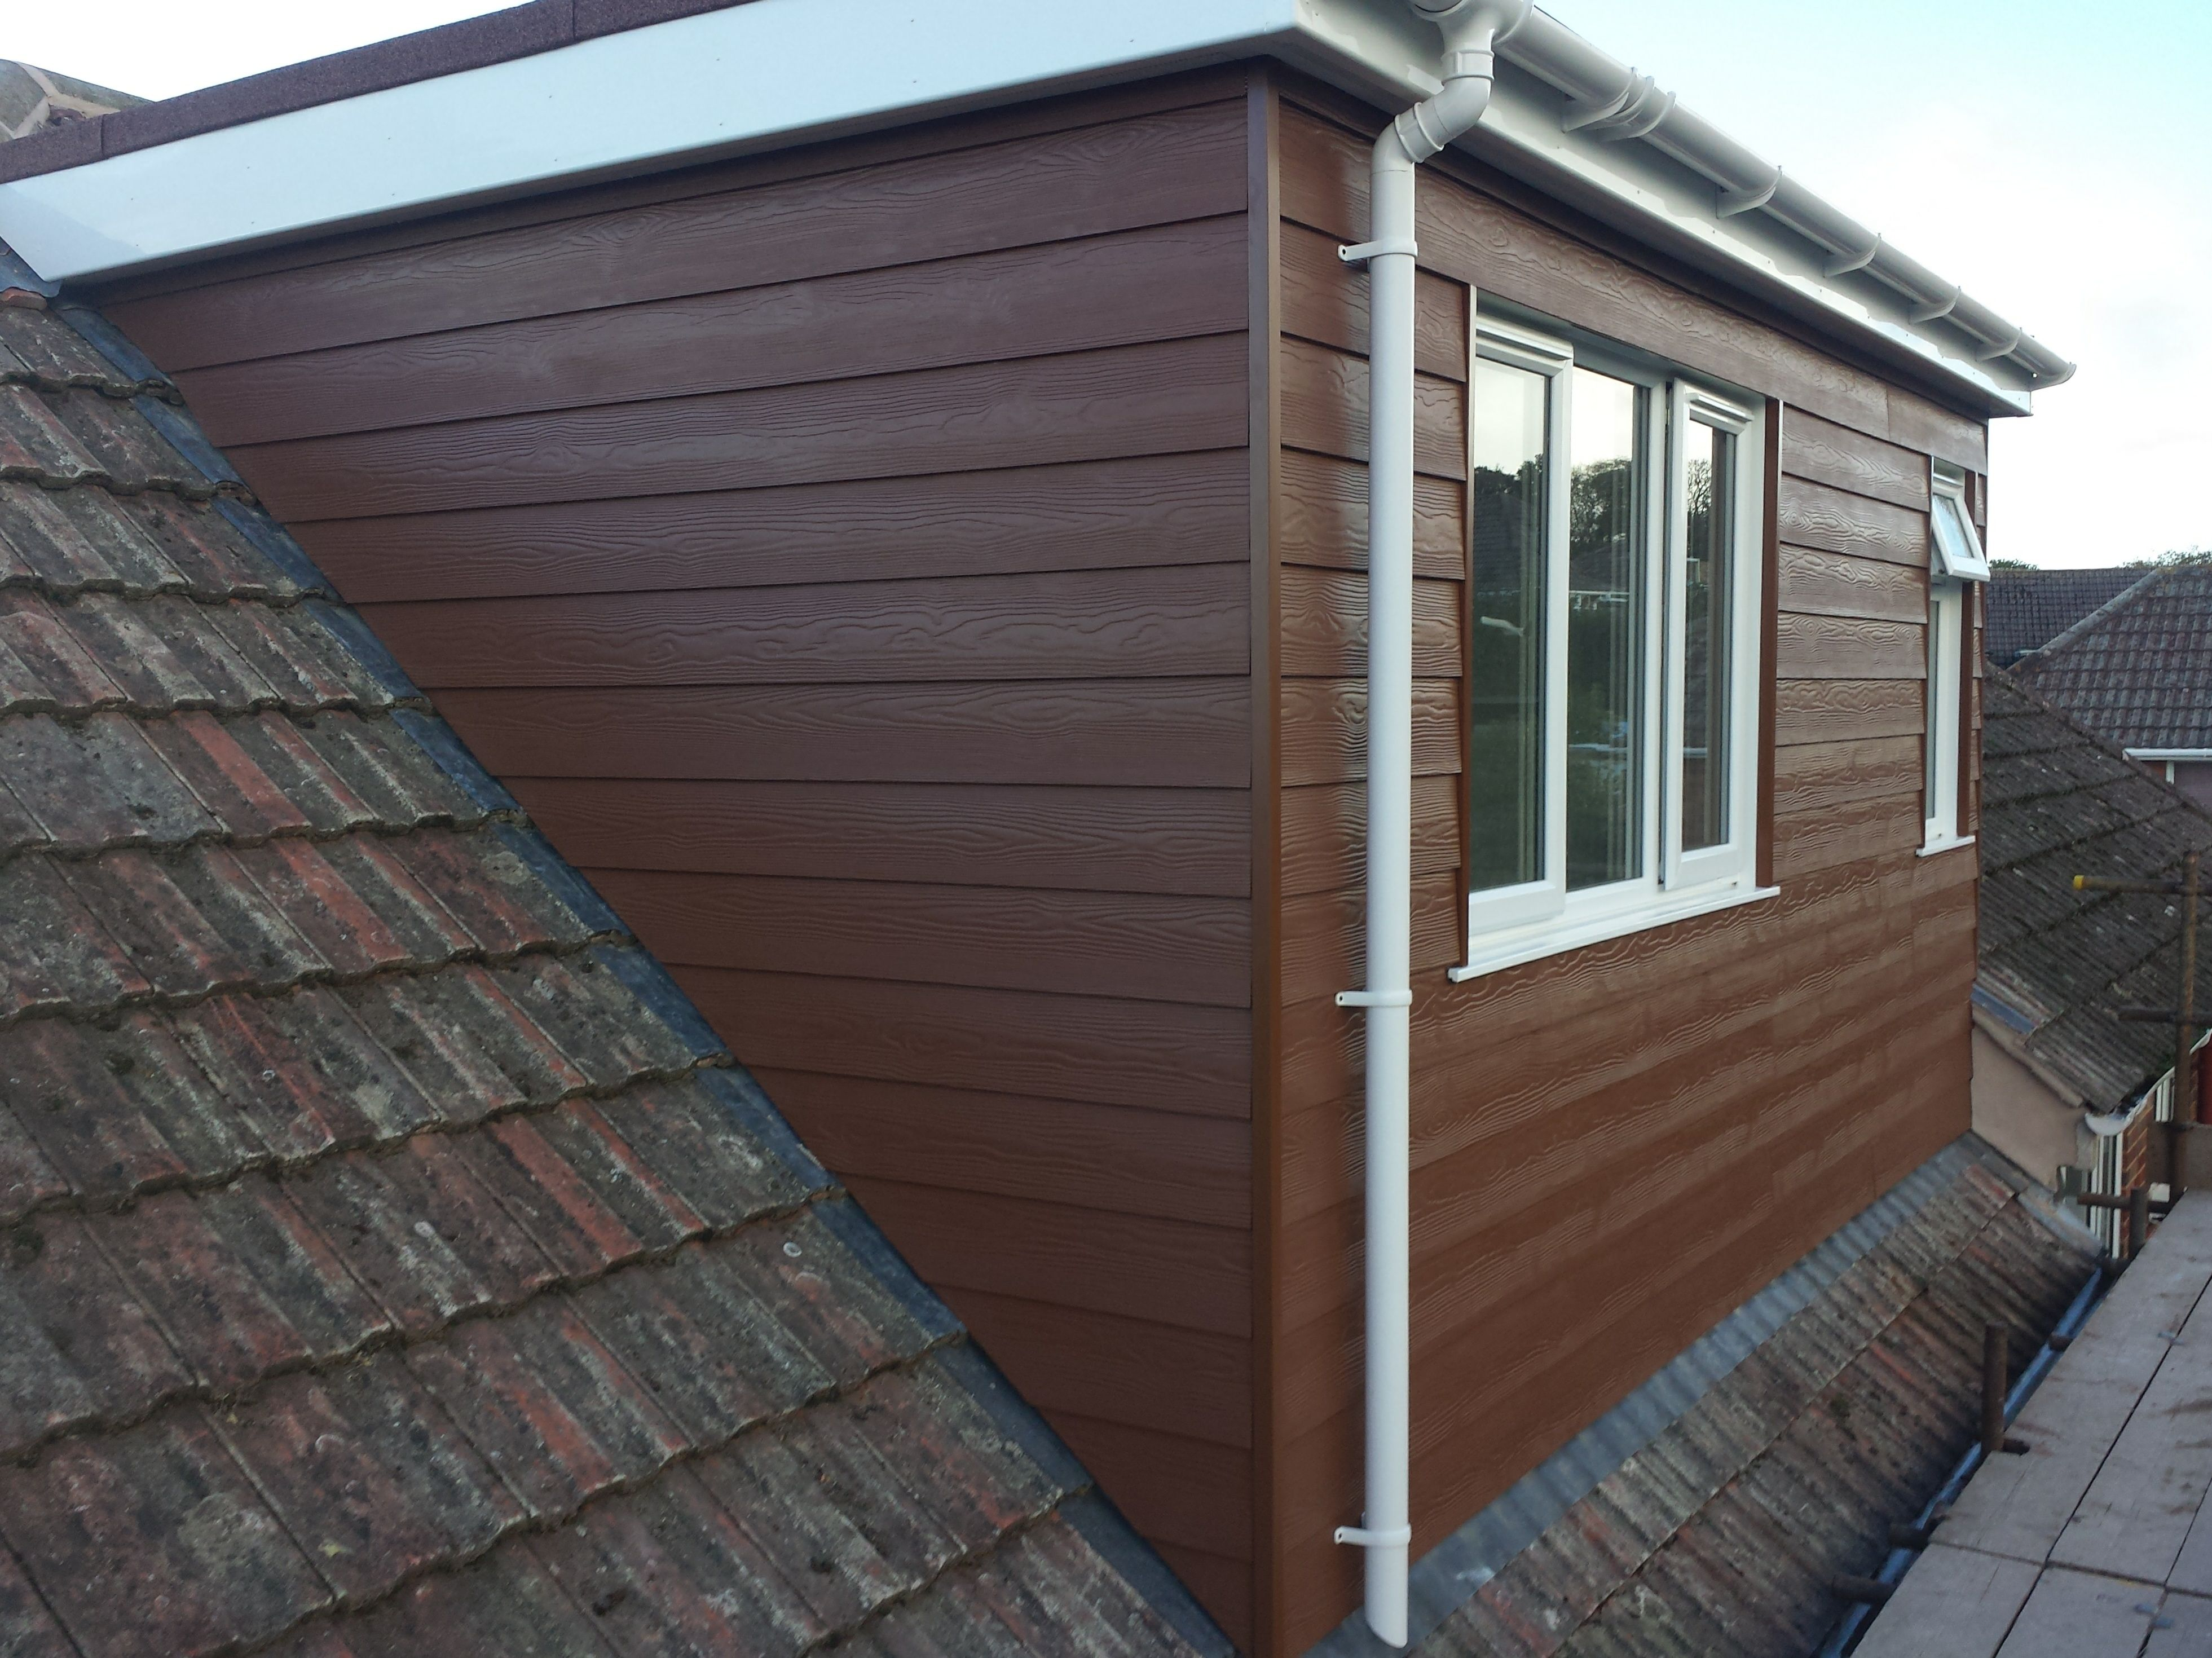 Flat roof dormers dormers attic designs dormer for Window roof design